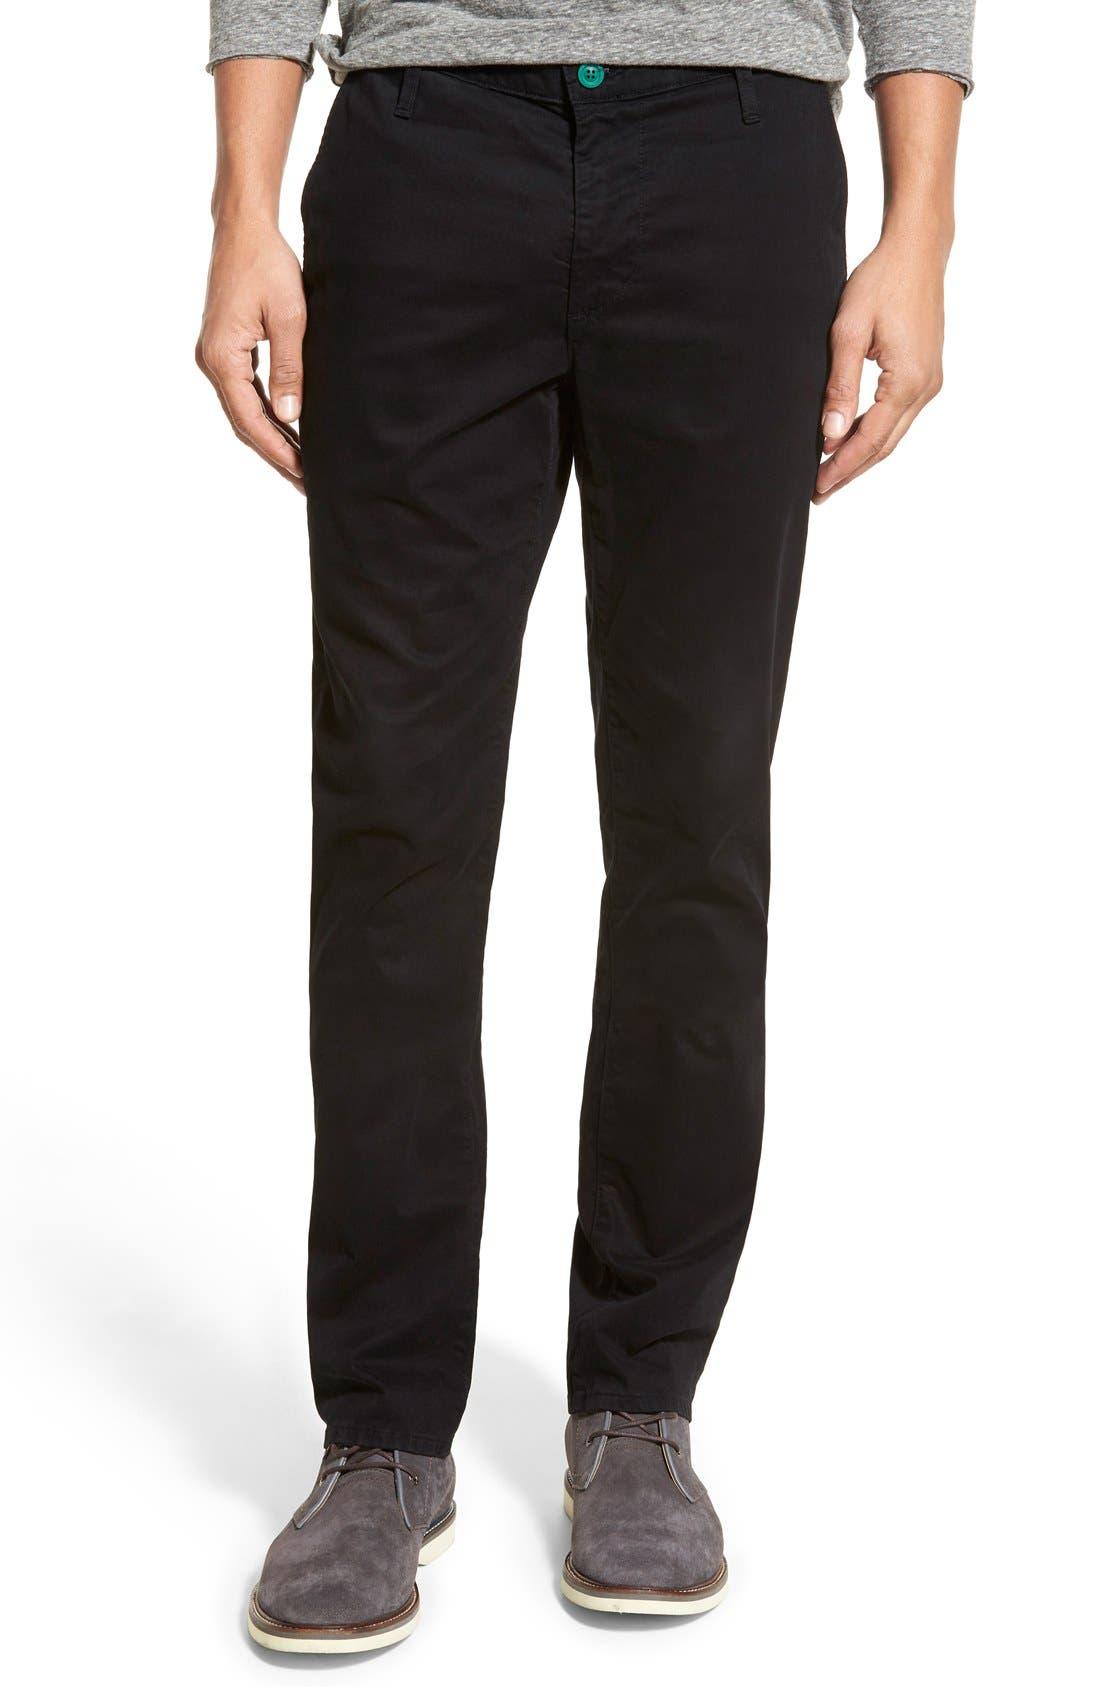 Main Image - AG Green Label 'Graduate' Slim Straight Leg Golf Pants